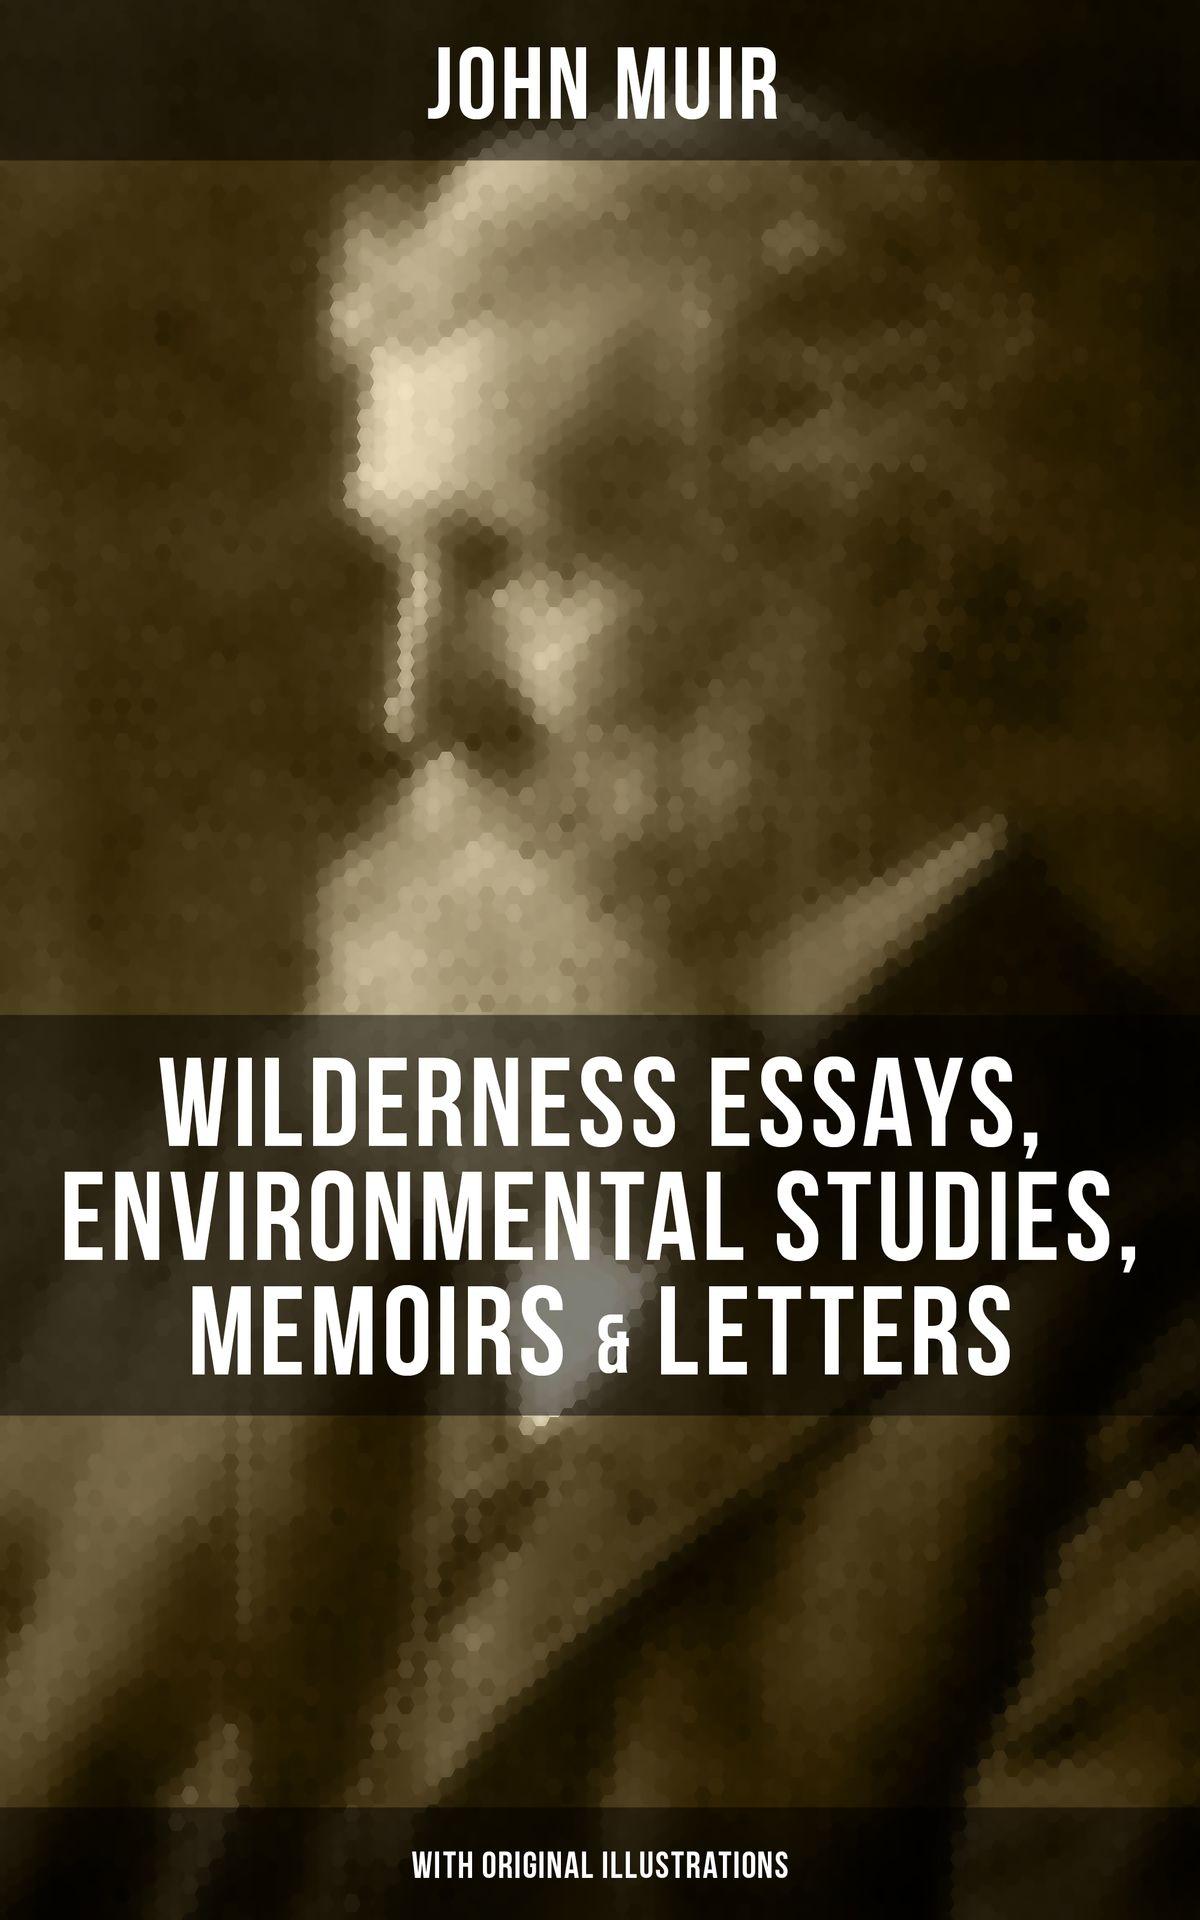 016 Essay Example John Muir Wilderness Essays Environmental Studies Memoirs Letters With Original Best Pdf Review Full